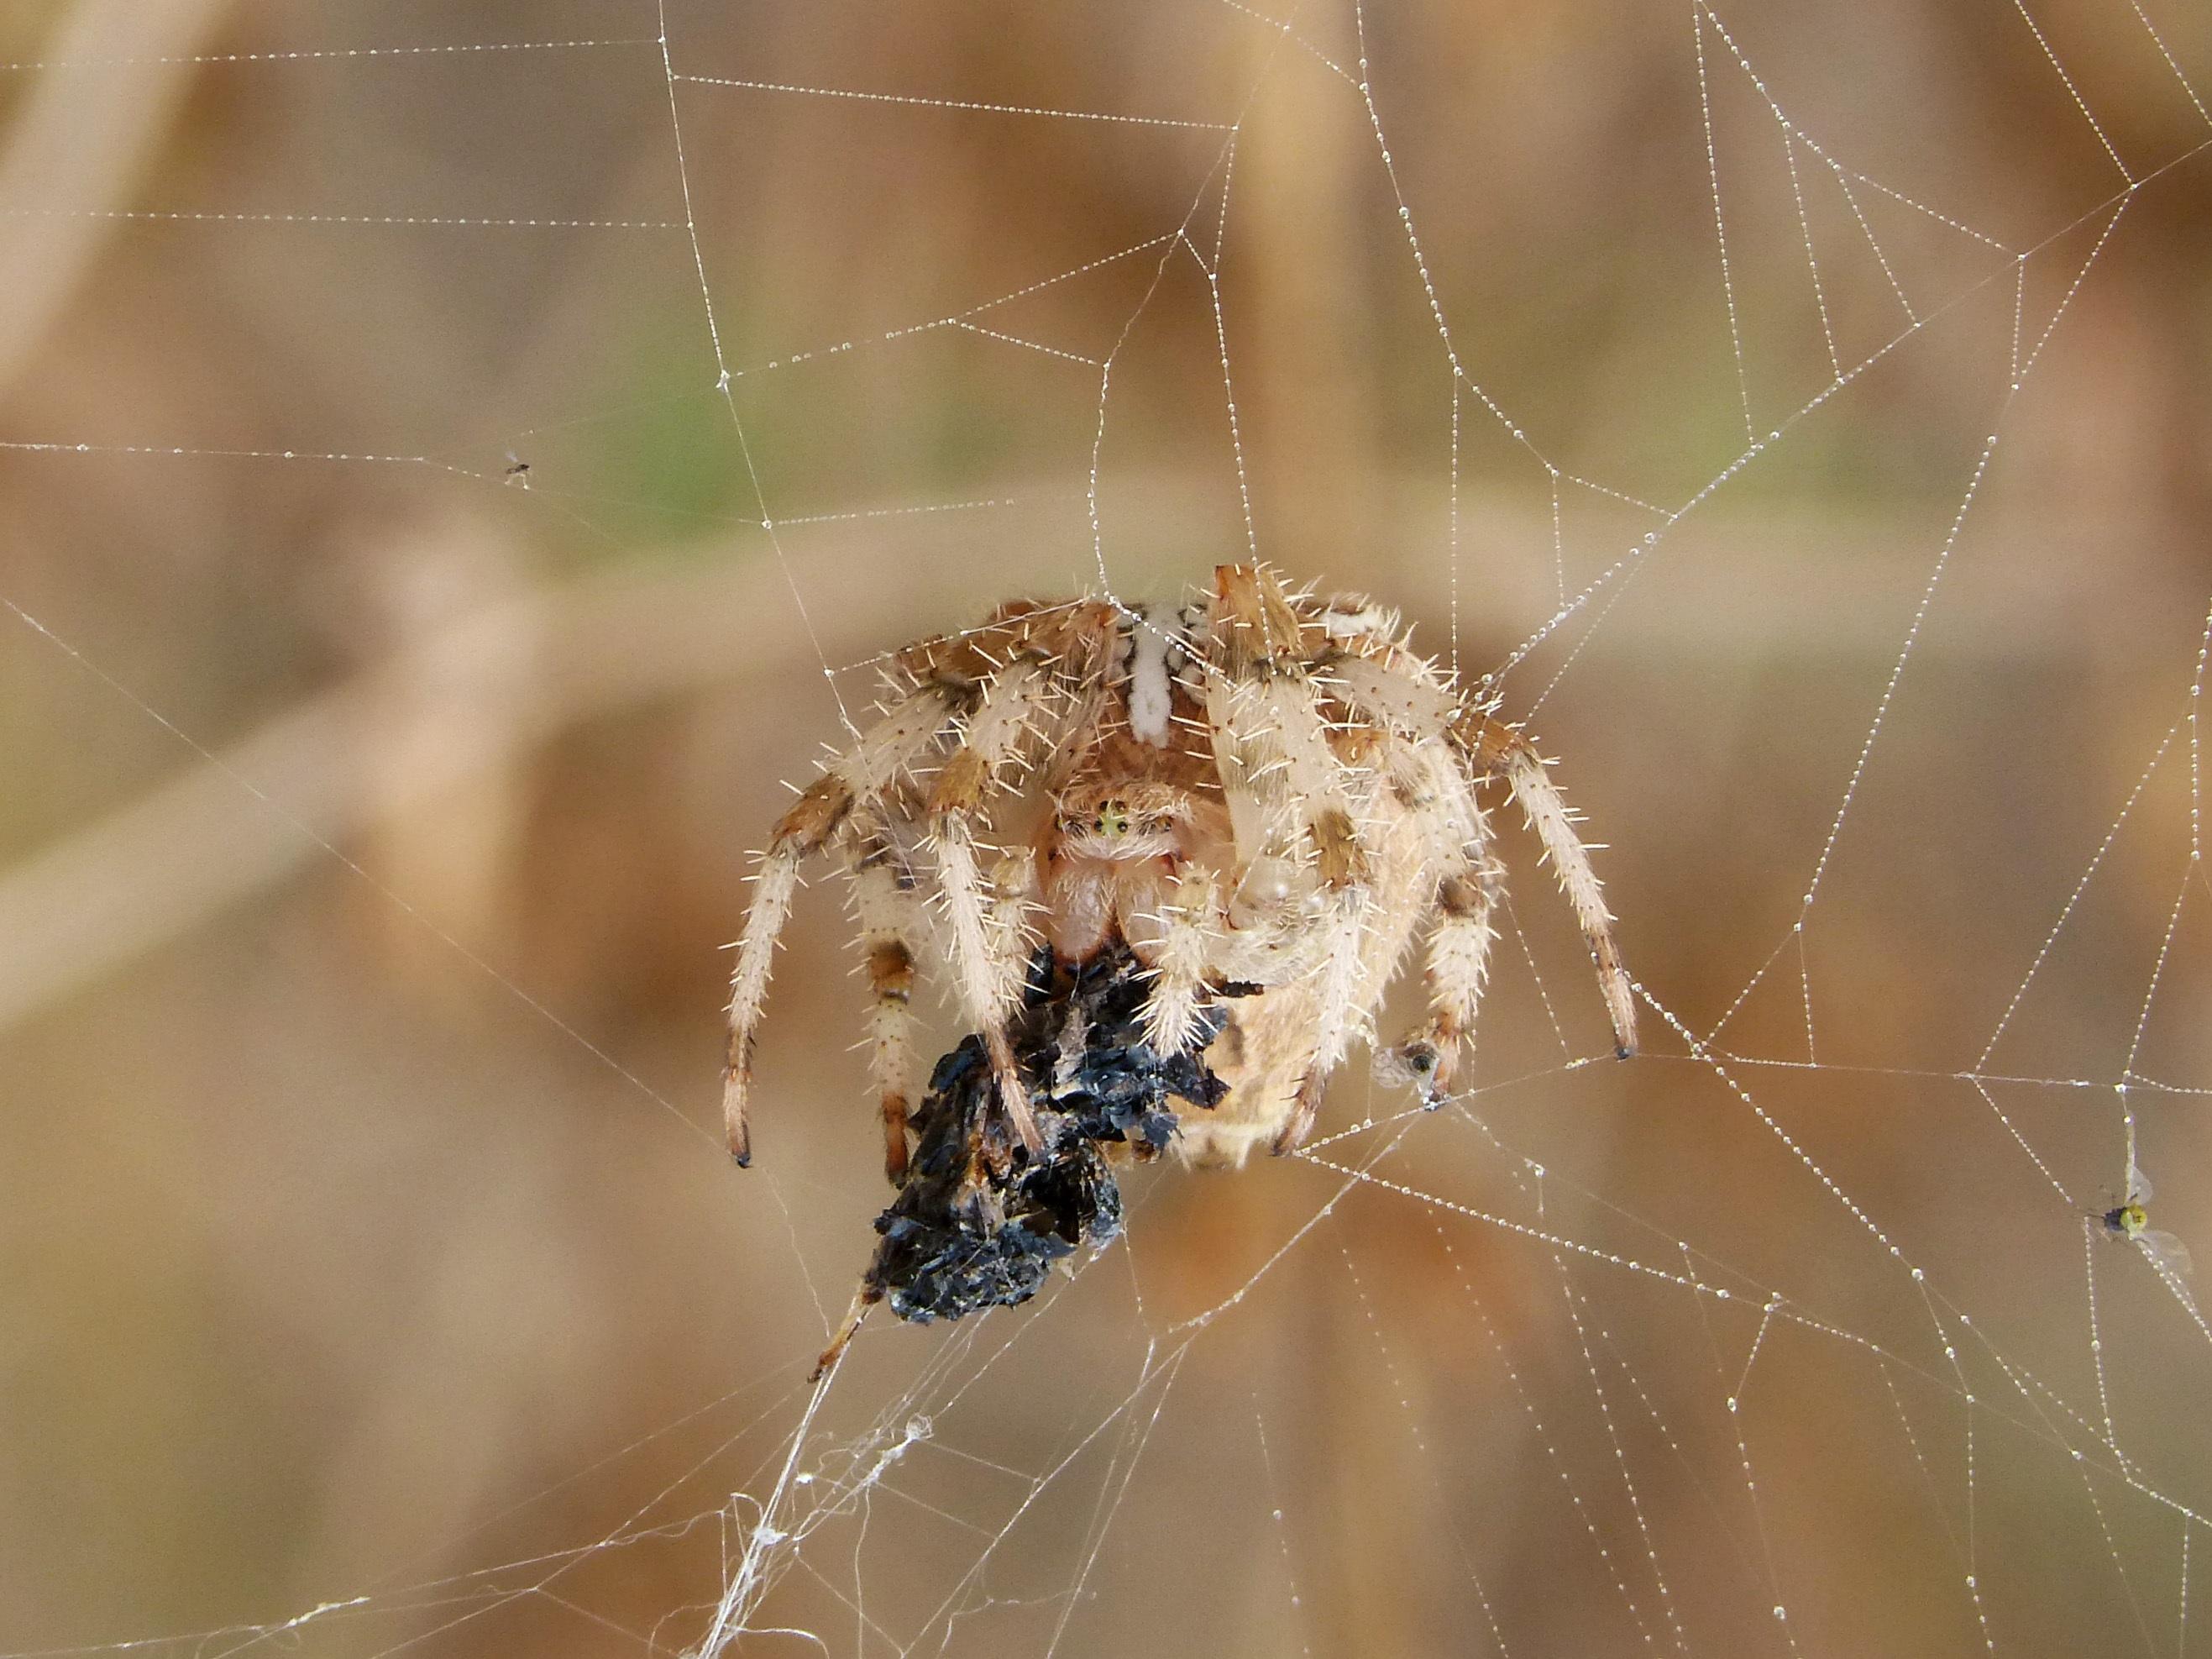 Free Images : nature, fauna, material, invertebrate, spider web ...